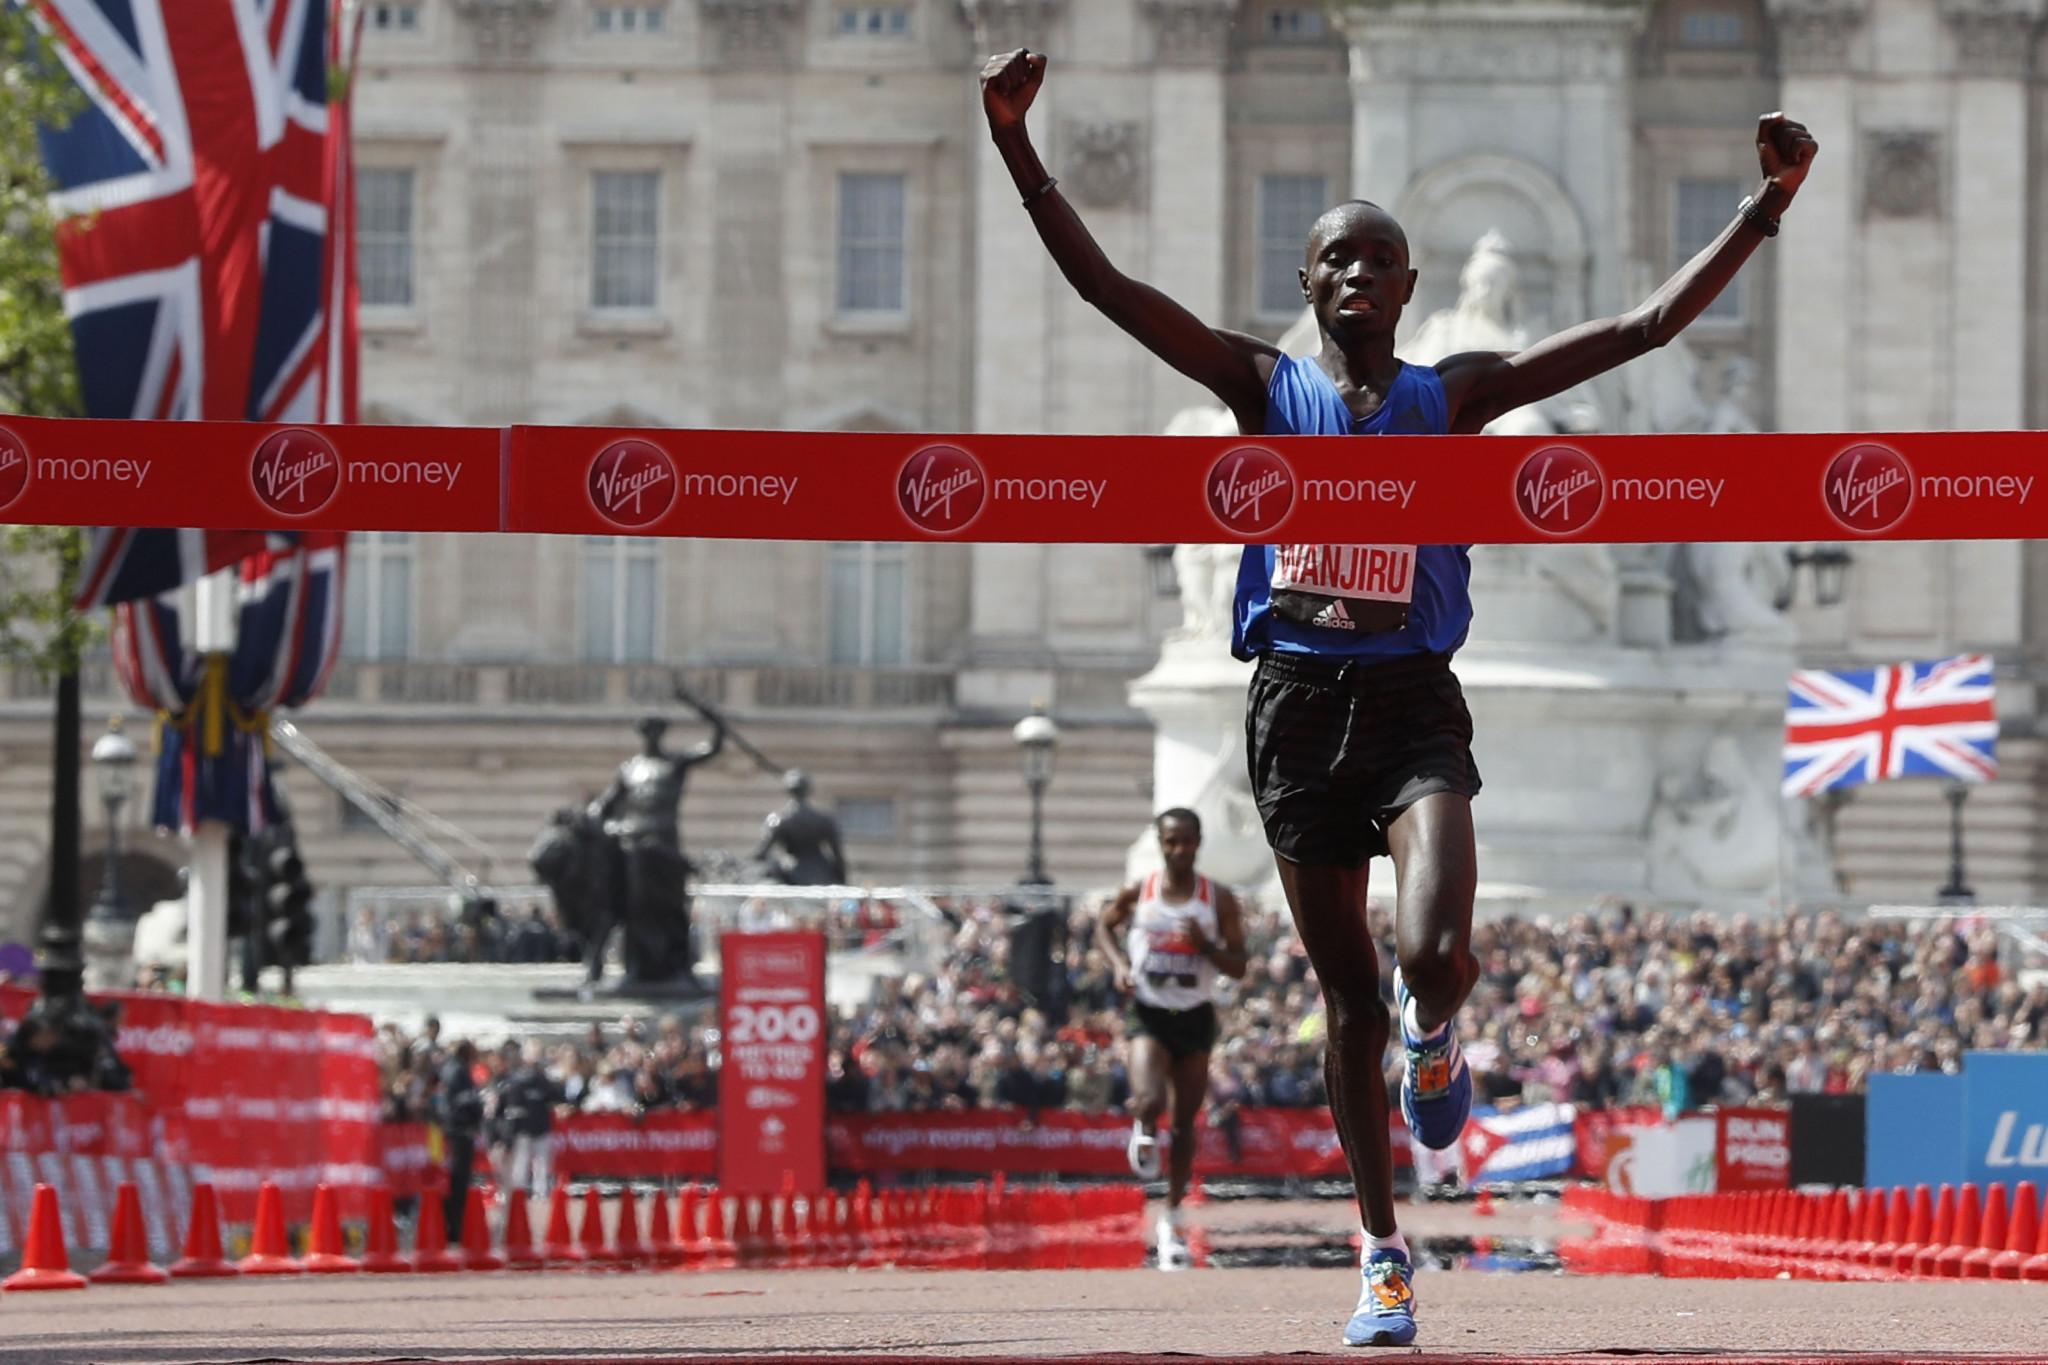 Daniel Wanjiru won the London Marathon back in 2017 ©Getty Images